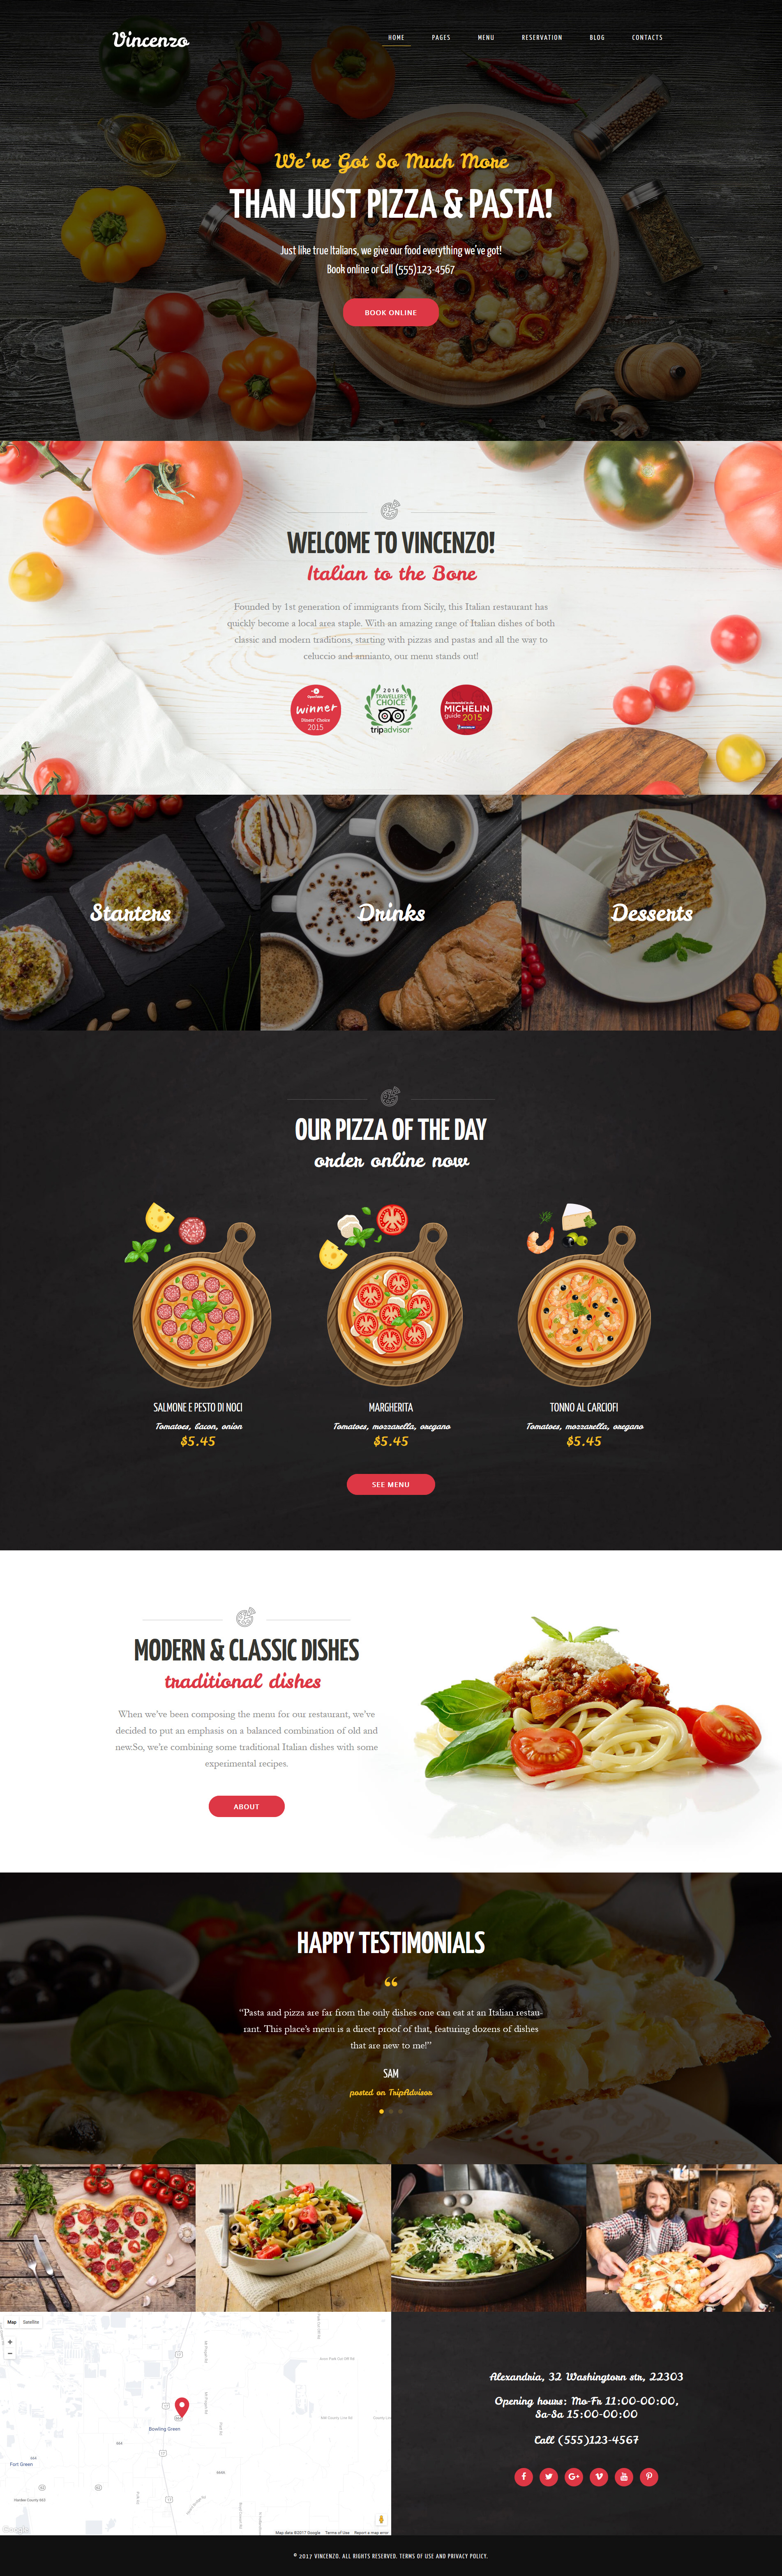 """Vincenzo - Delicious Pizza Restaurant Responsive"" 响应式WordPress模板 #63633"